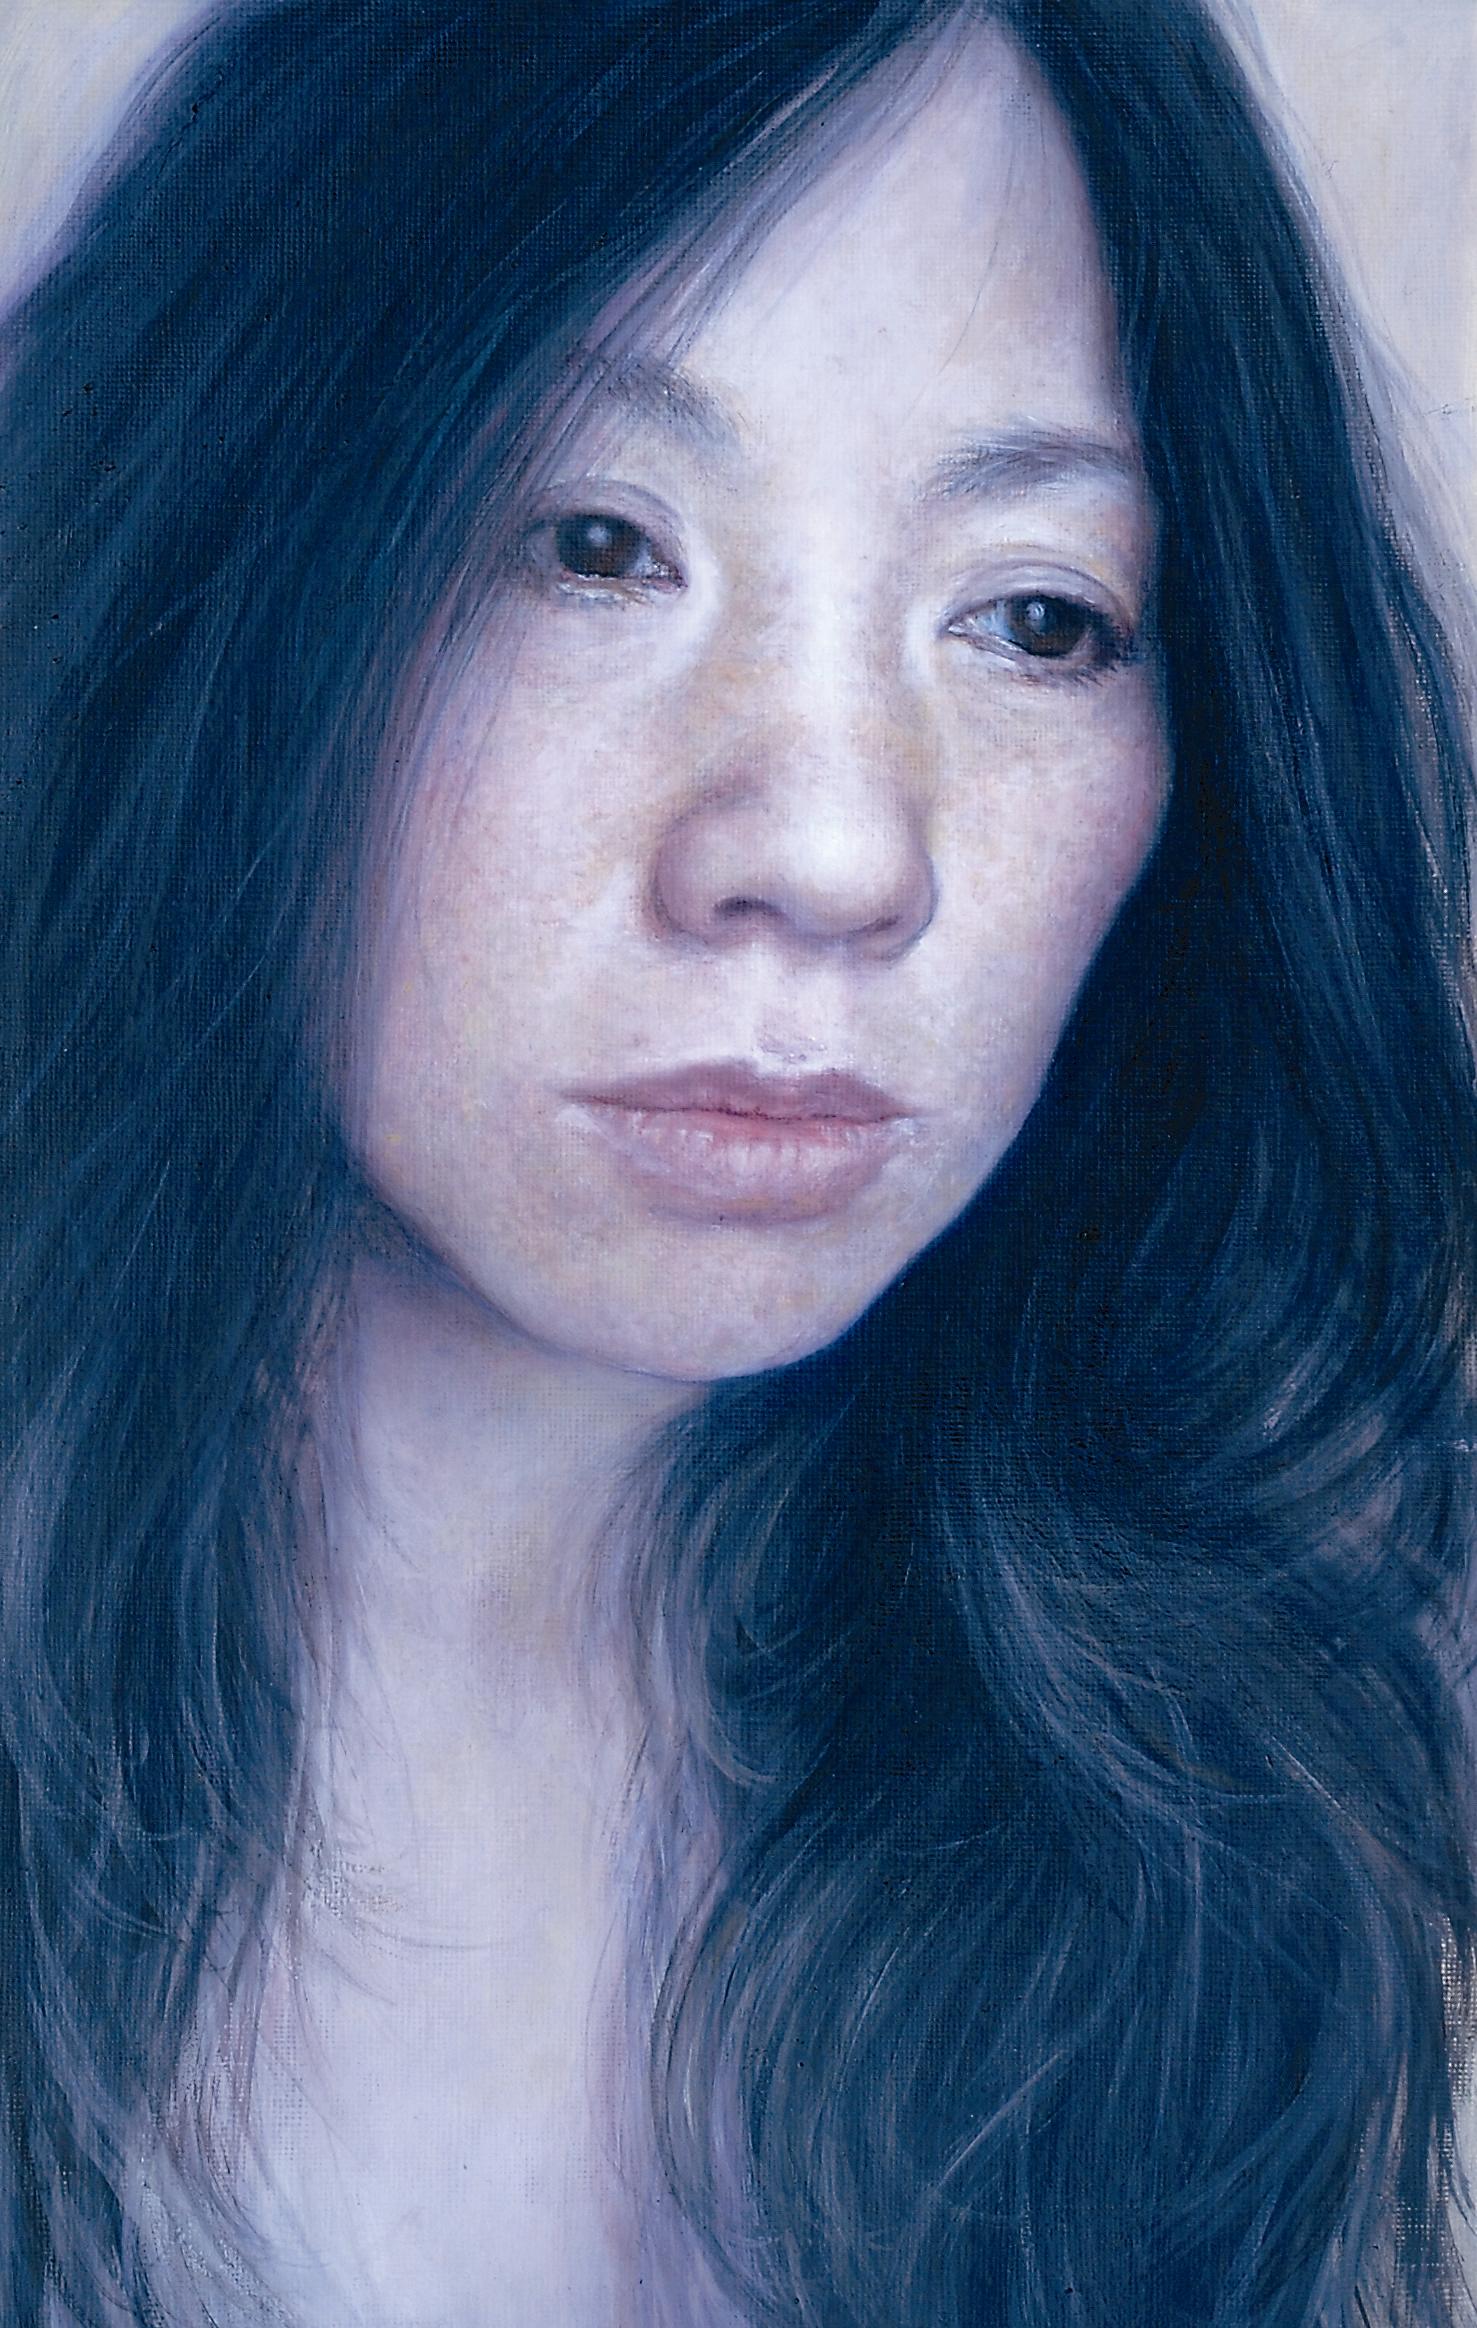 MiseonLee-SelfPortrait.PNG (1477×2328)